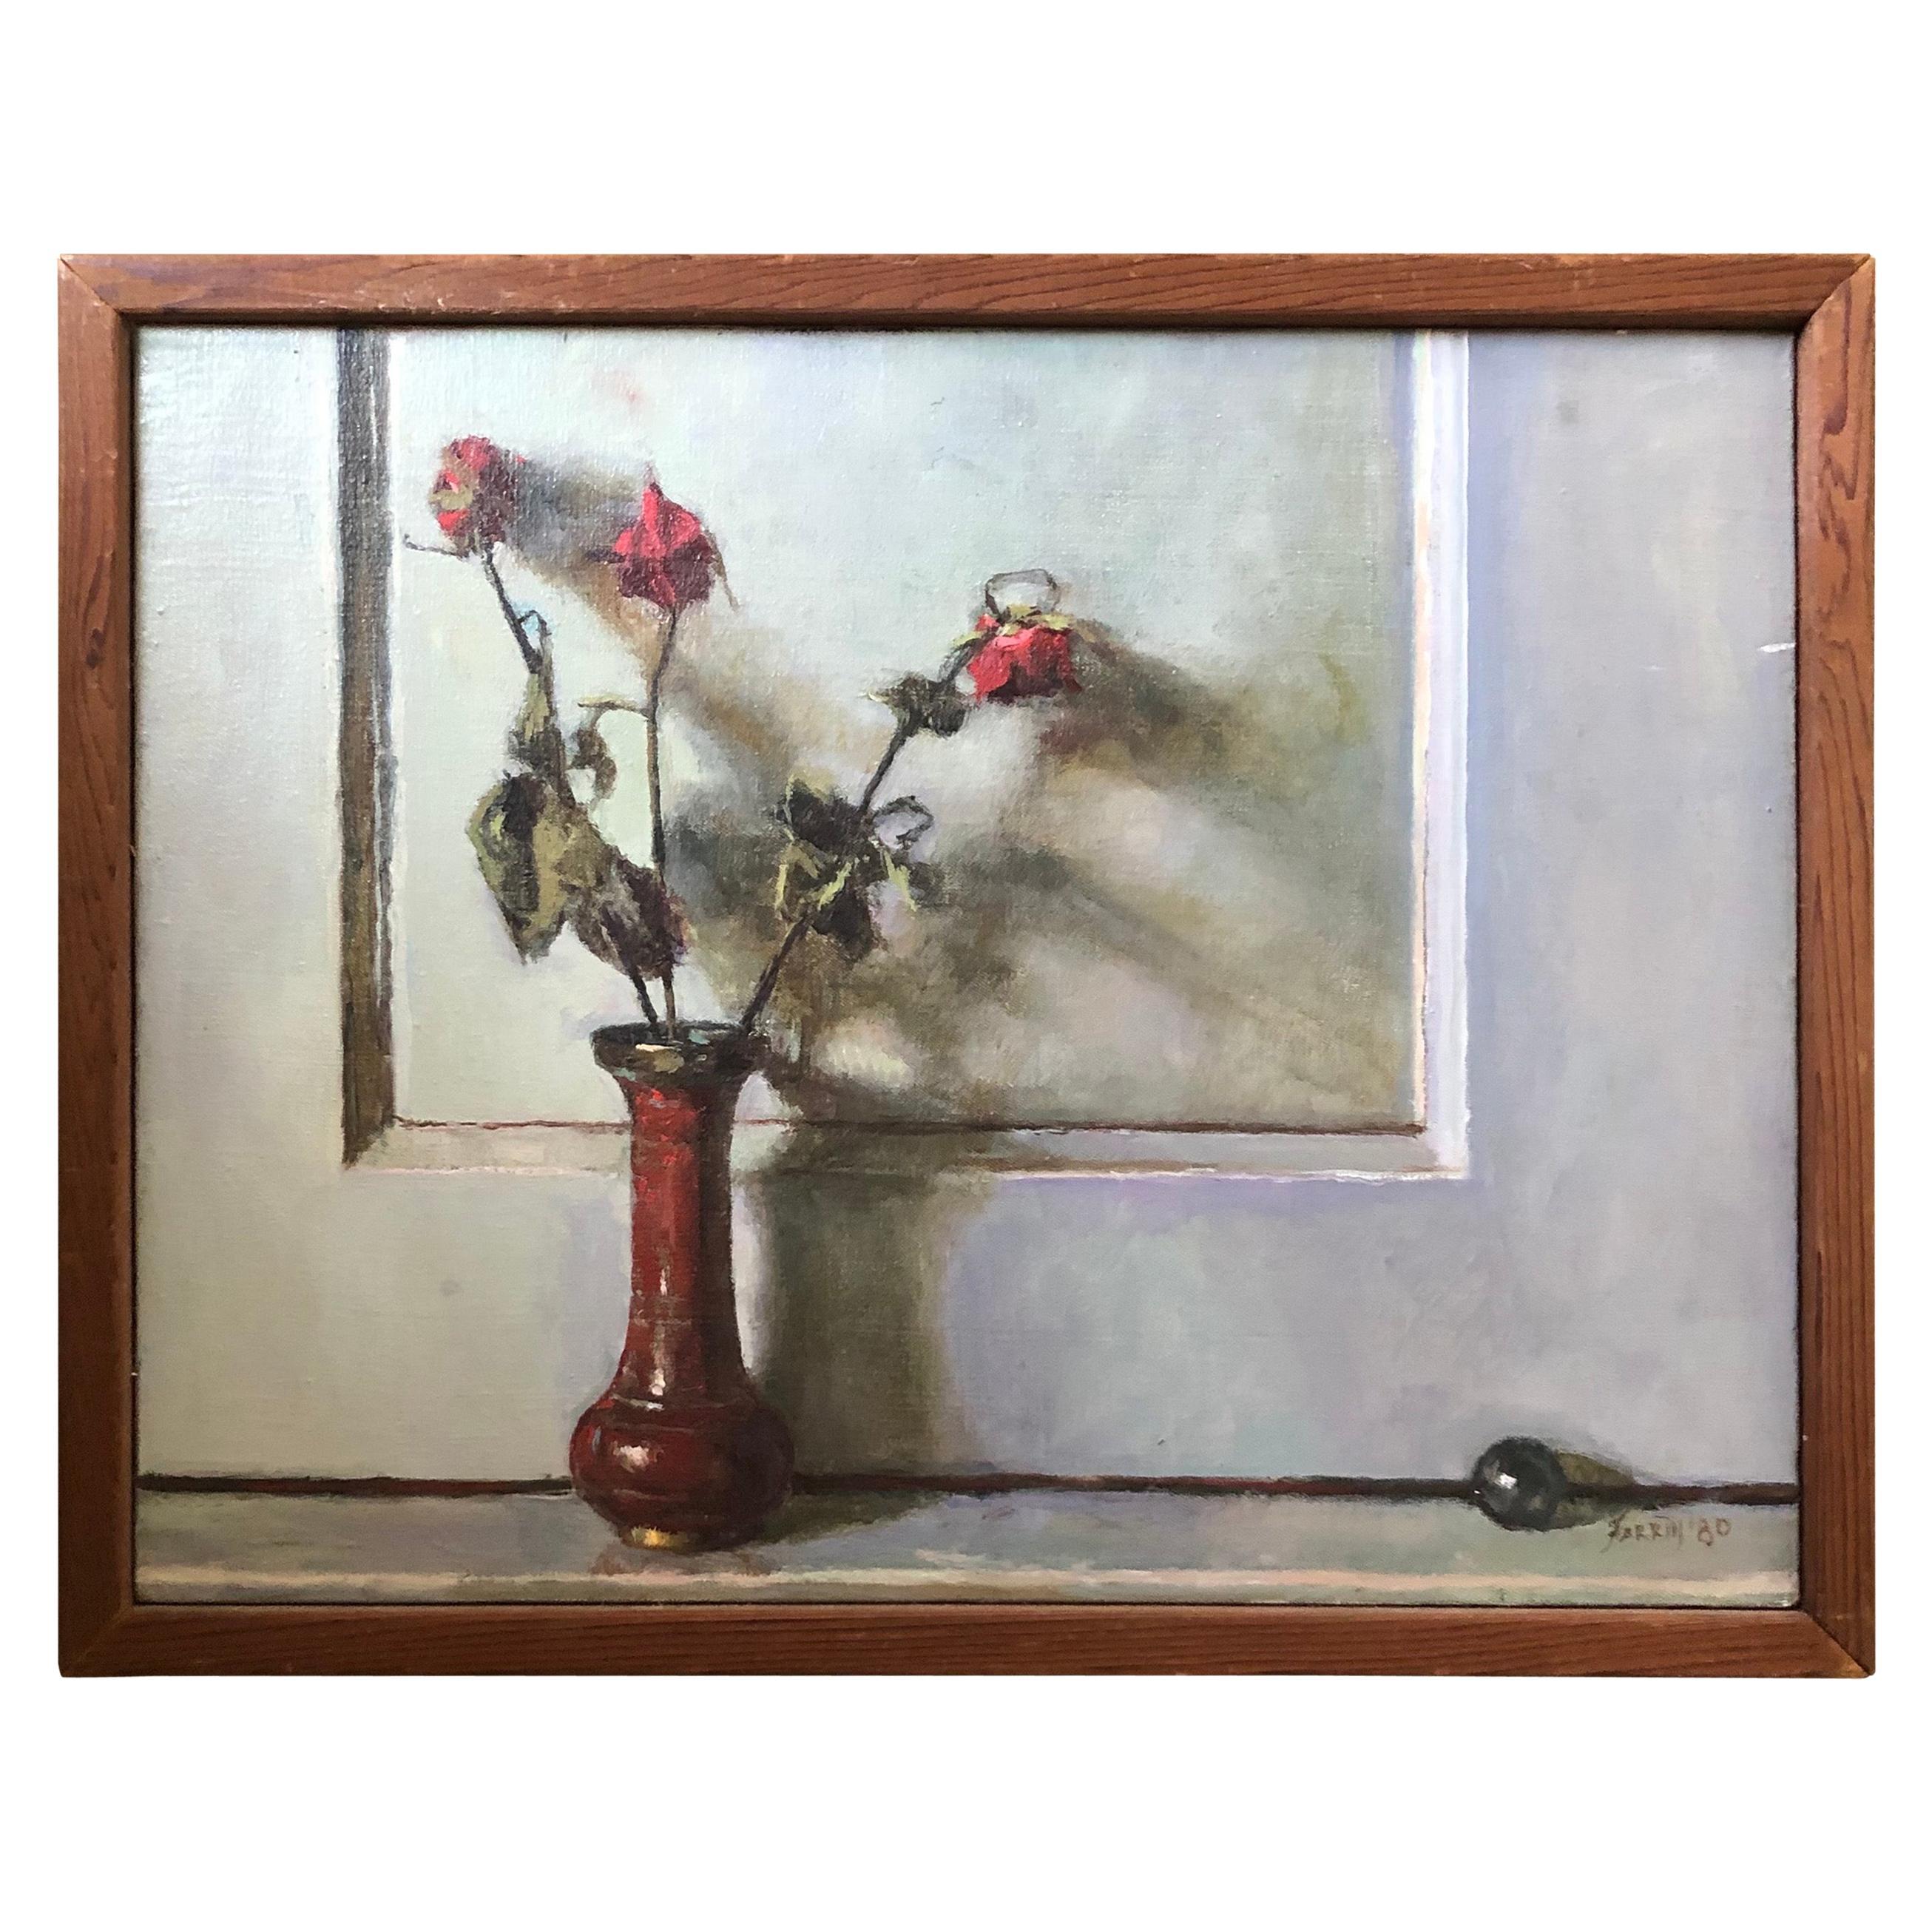 Oil on Canvas Still Life Painting by Listed Artist Doug Ferrin